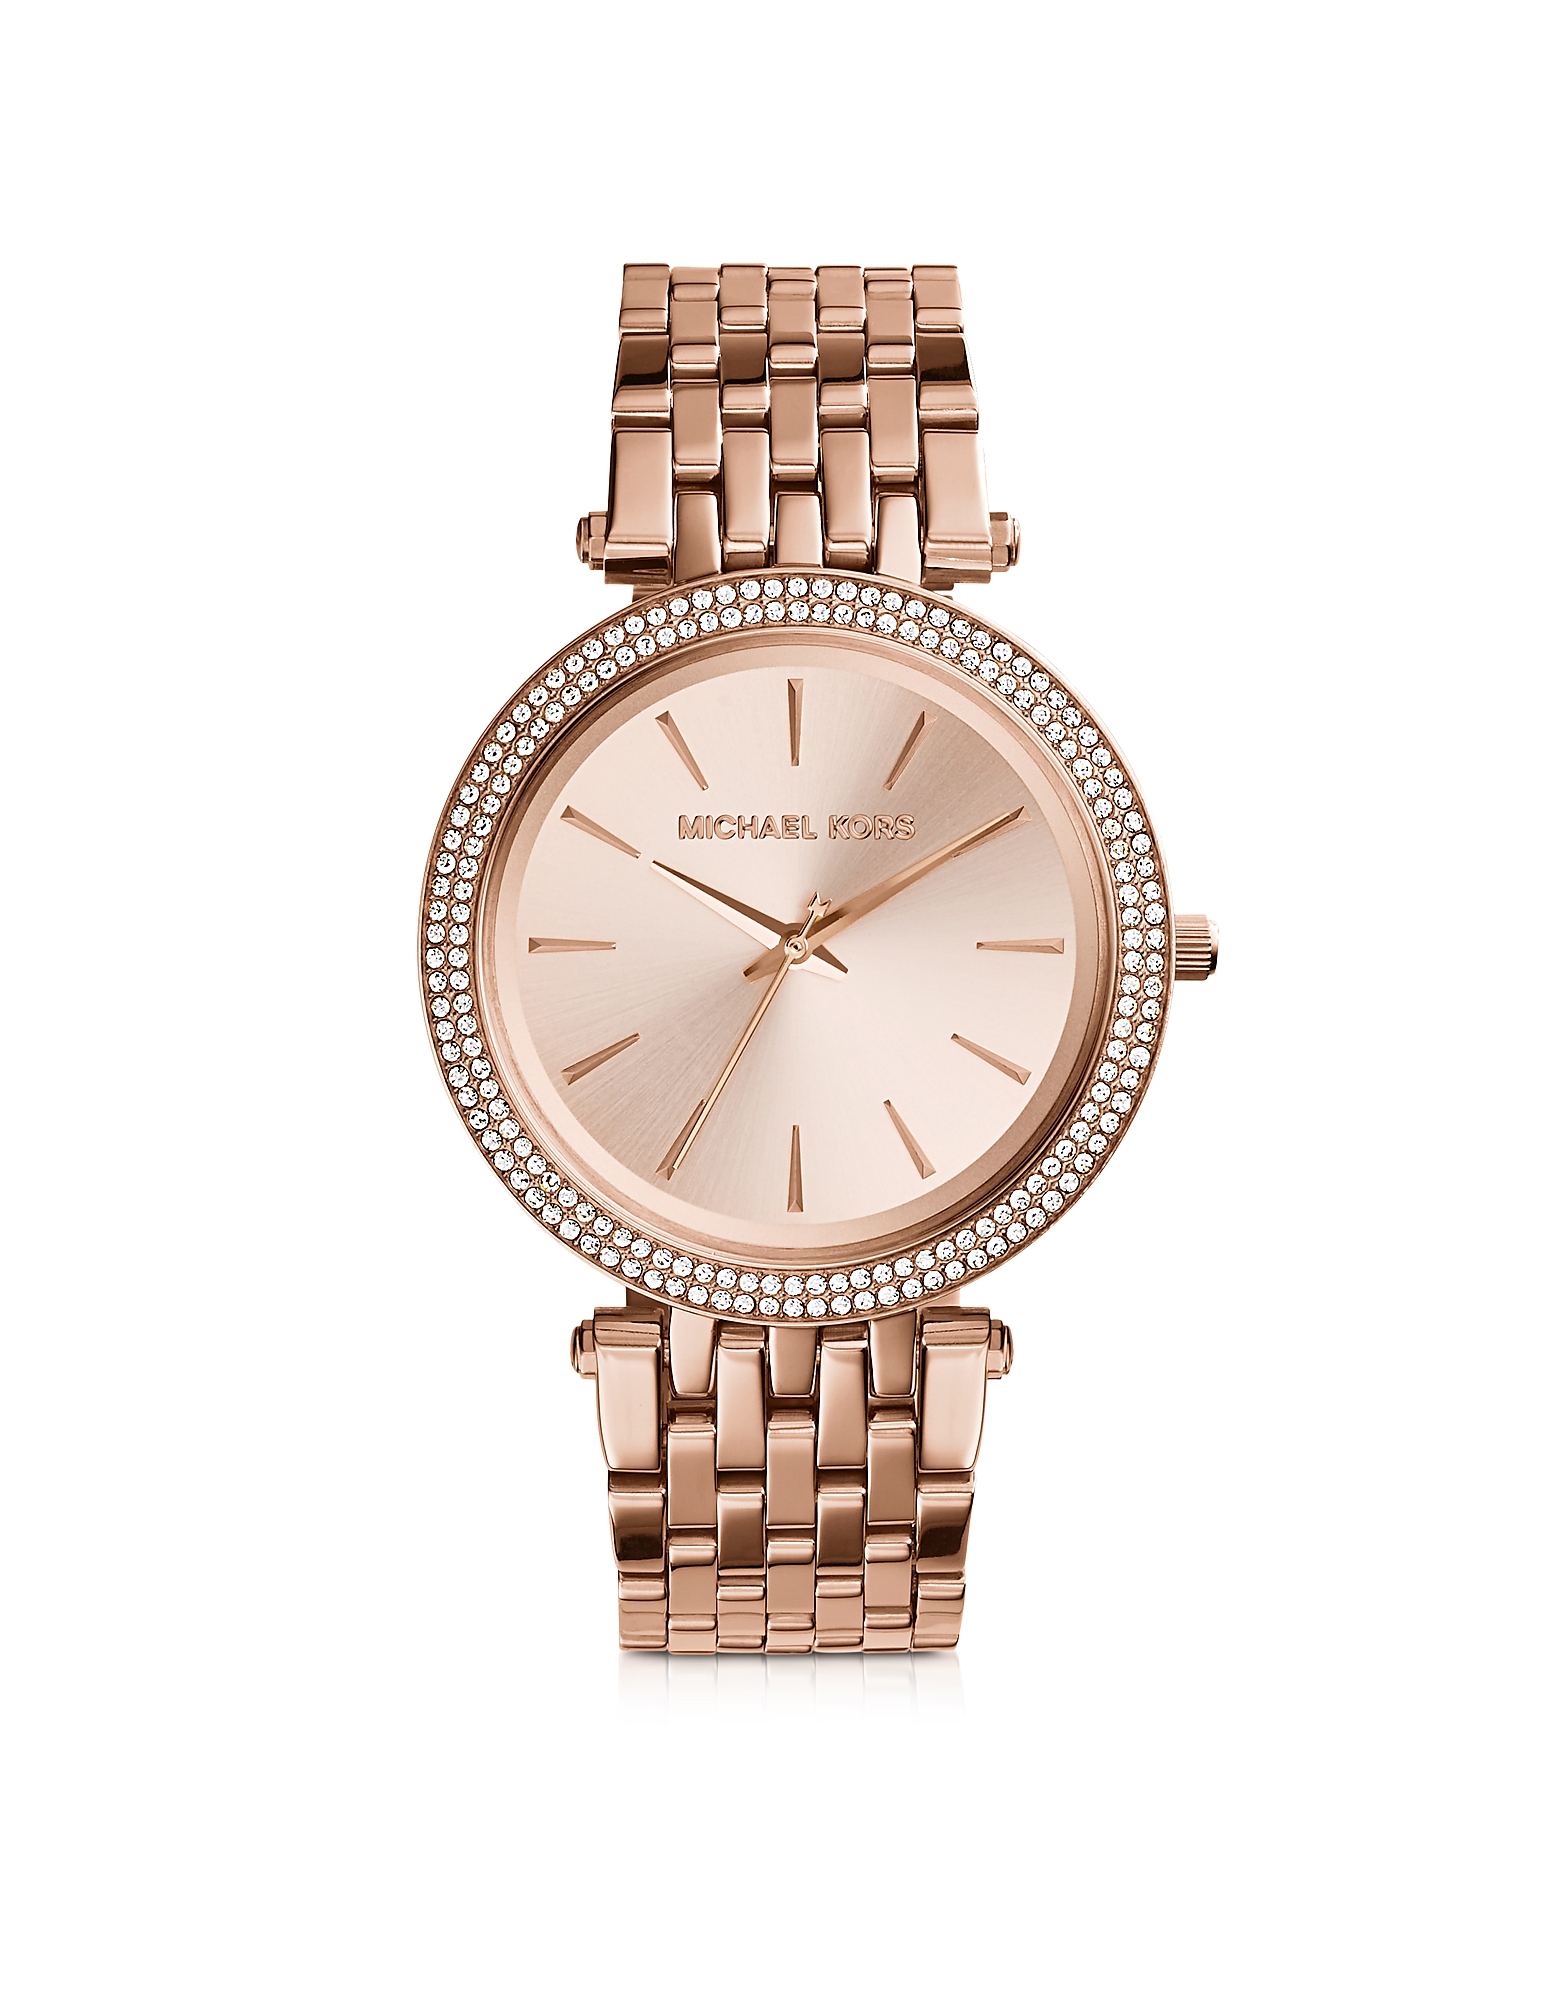 Michael Kors Women's Watches, Darci Stainless Steel Women's Watch